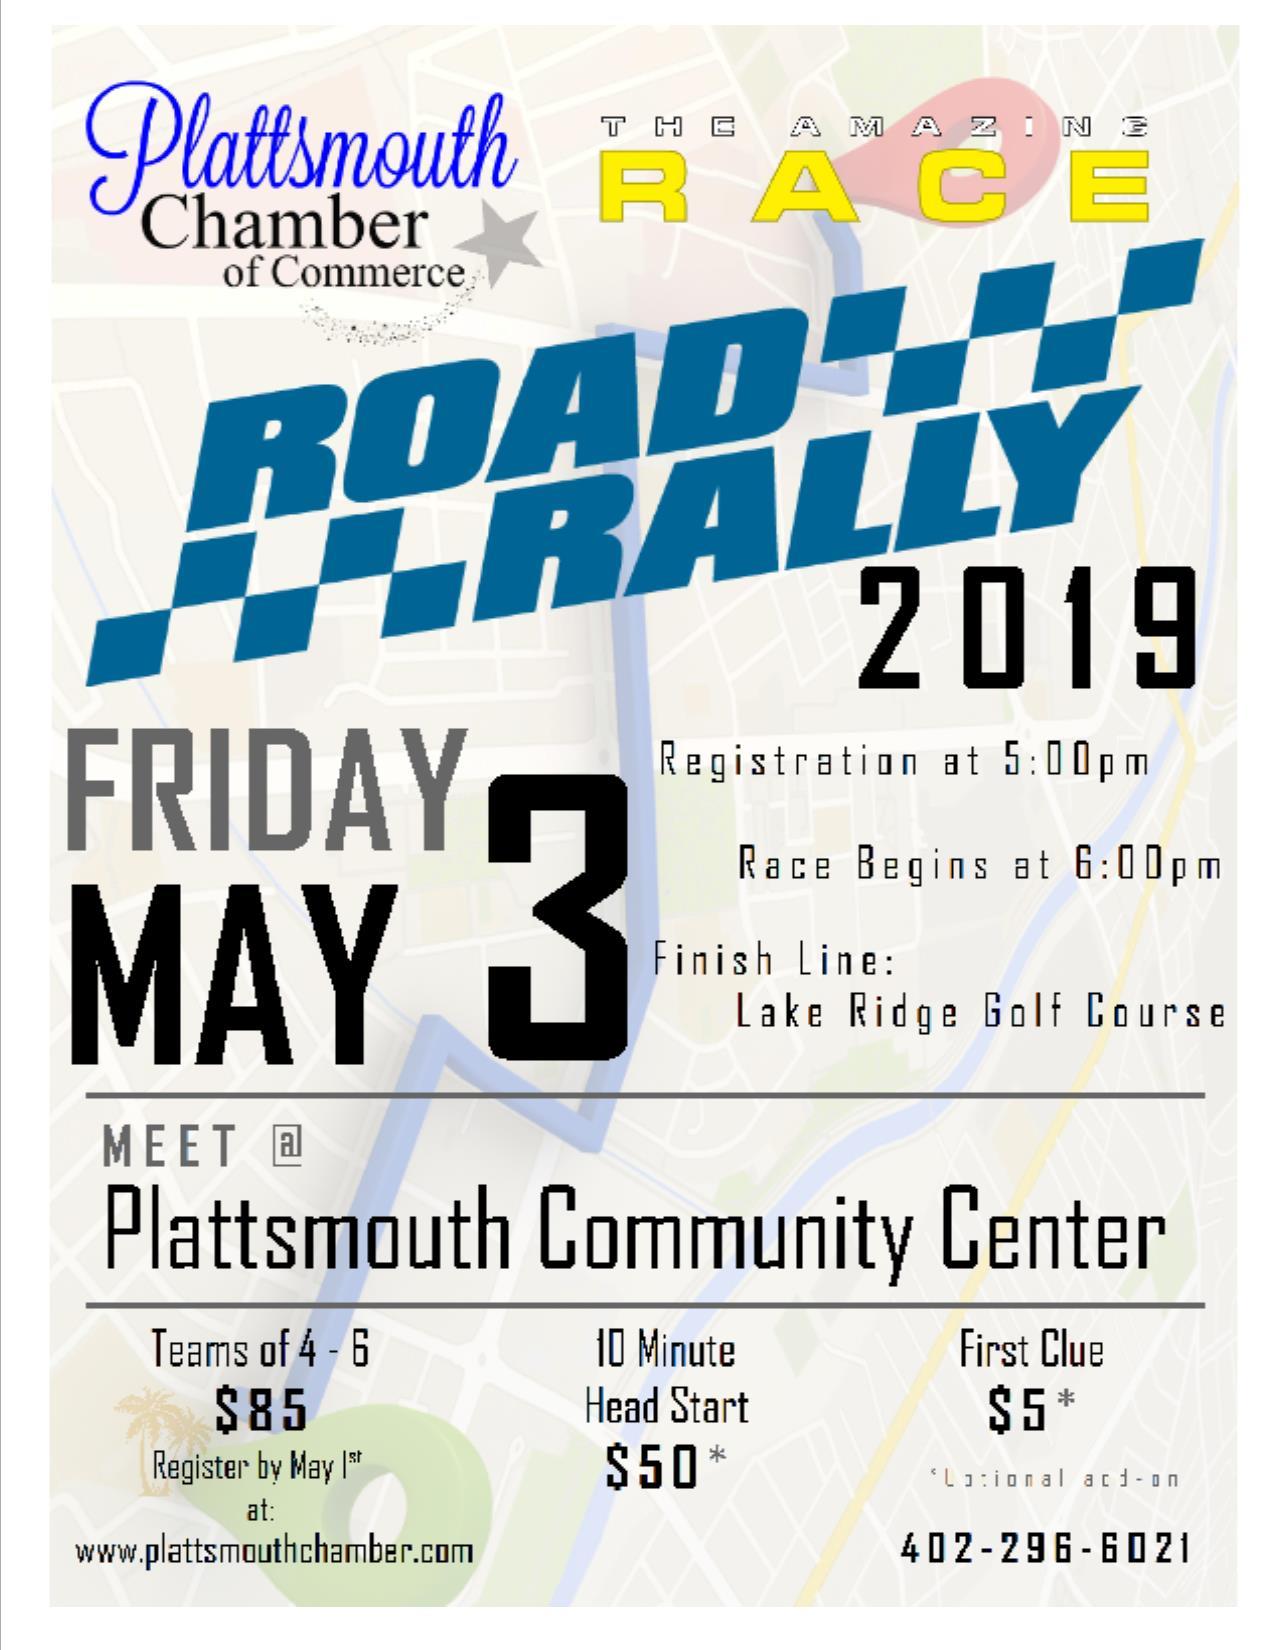 Plattsmouth Chamber of Commerce Amazing Race - Plattsmouth Chamber of  Commerce